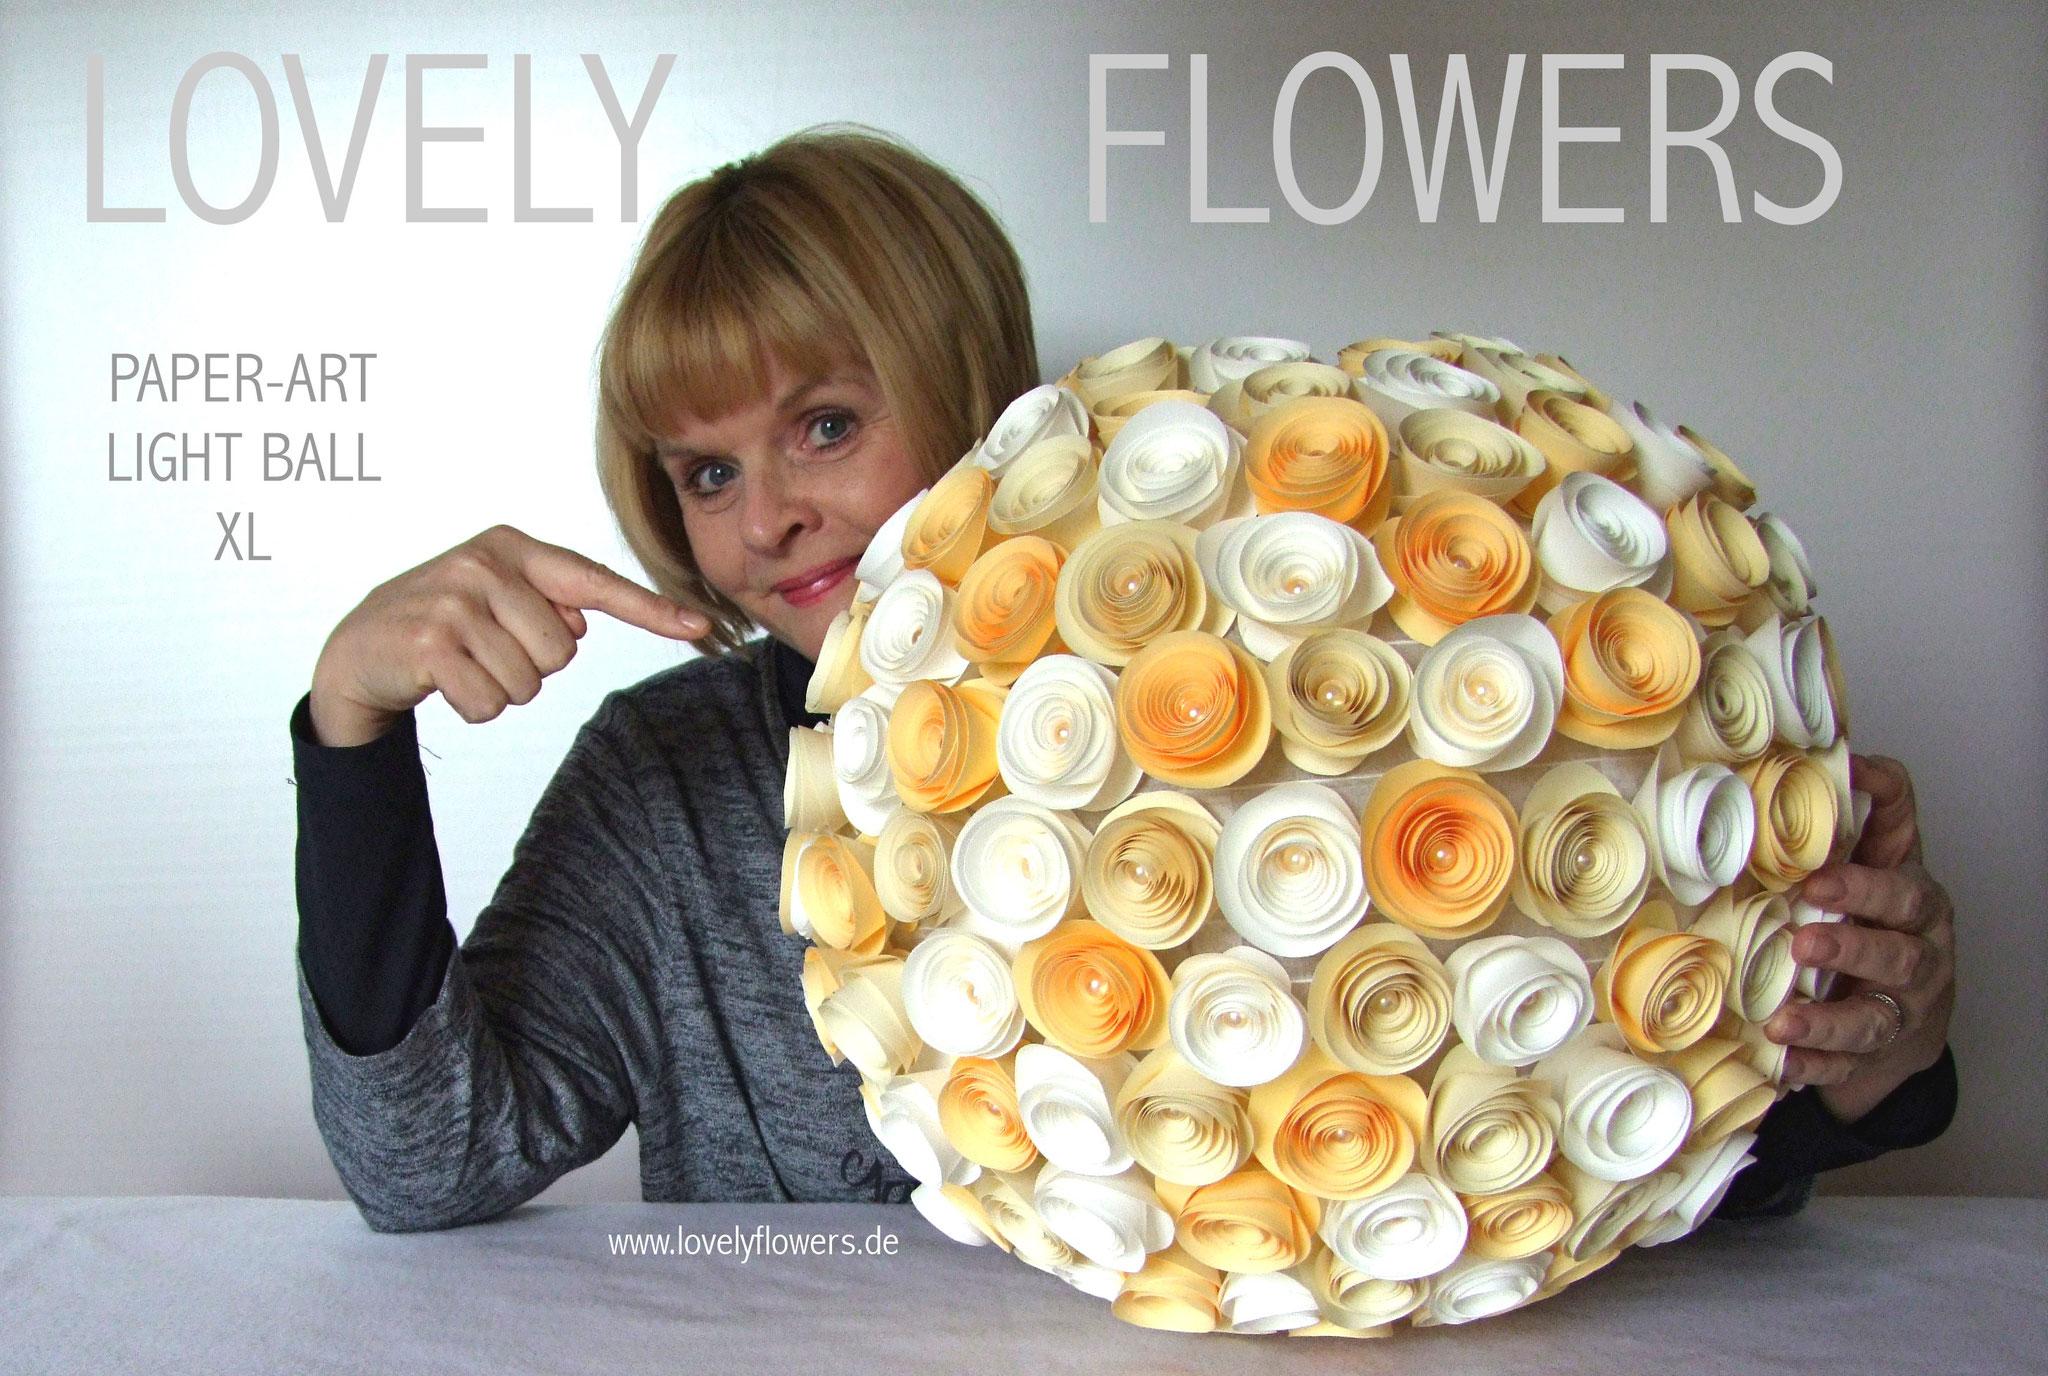 www.lovelyflowers.de - Paper Art Lampen gibts auch in gaaaanz groß!